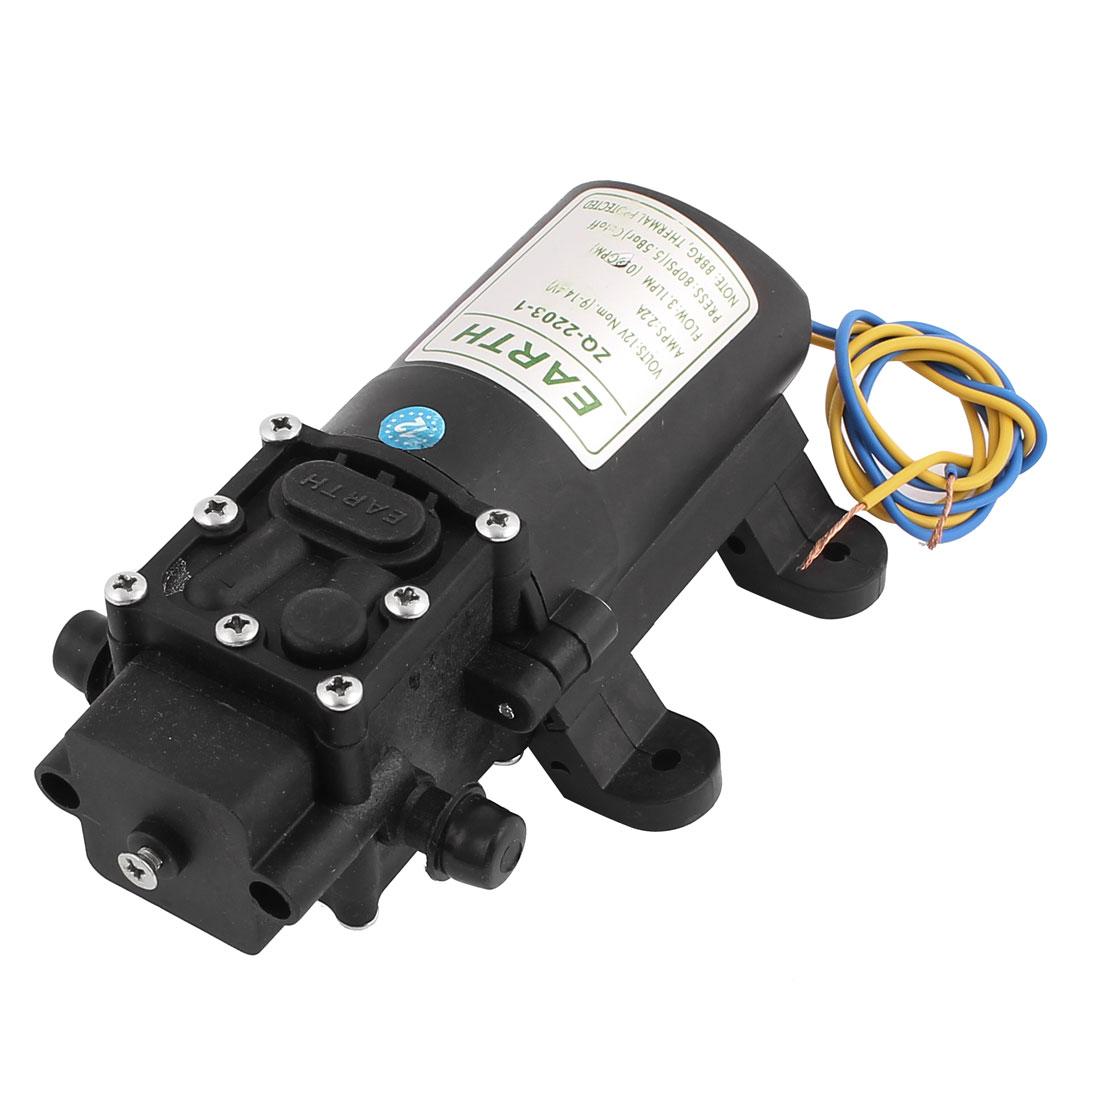 DC 12V Motor Electric High Pressure Micro Diaphragm Self Priming Water Pump Reflux